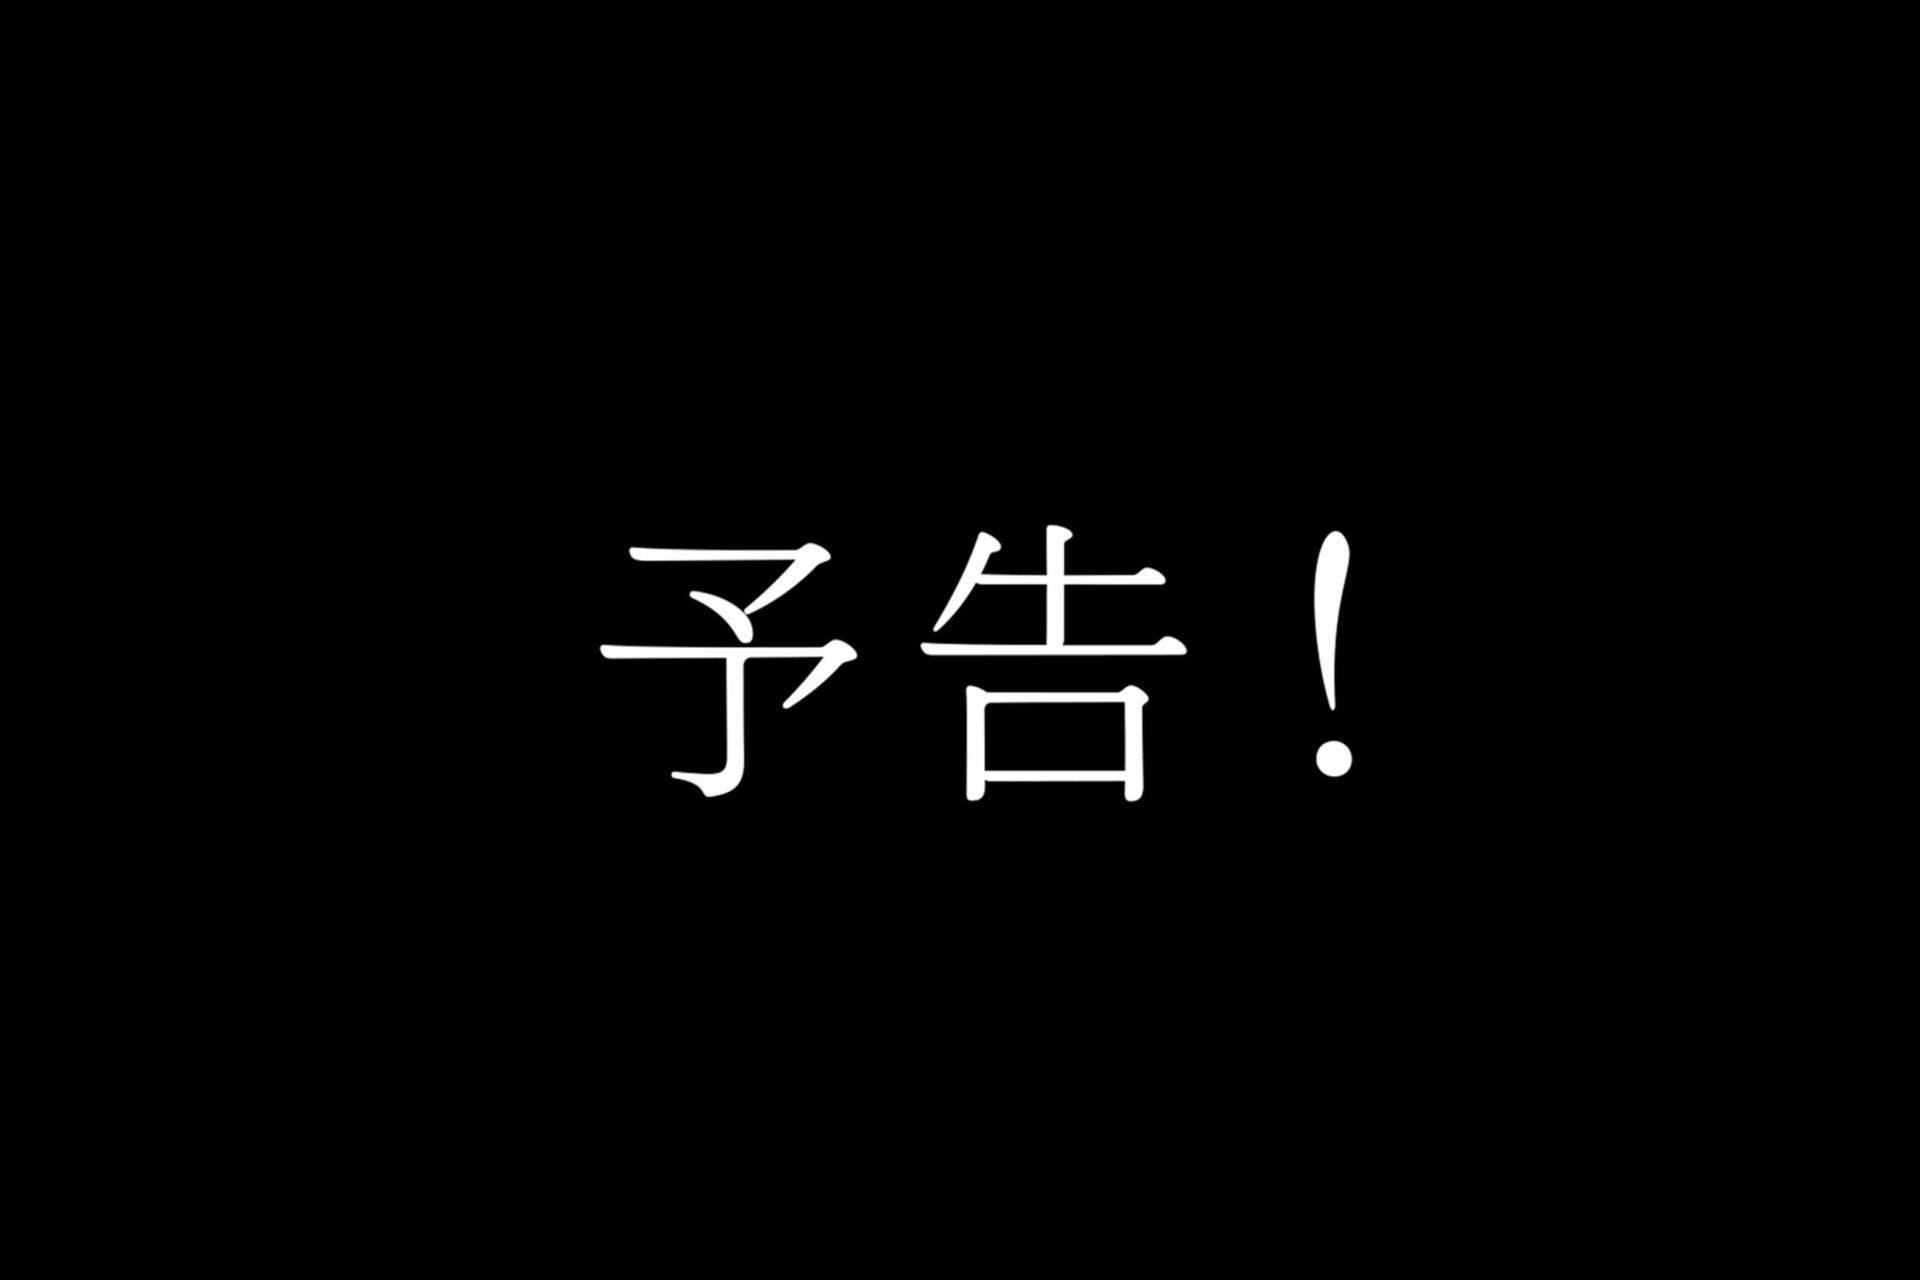 Akira Inoue Sayaka Ota Nakayama - Blog de nandi peru